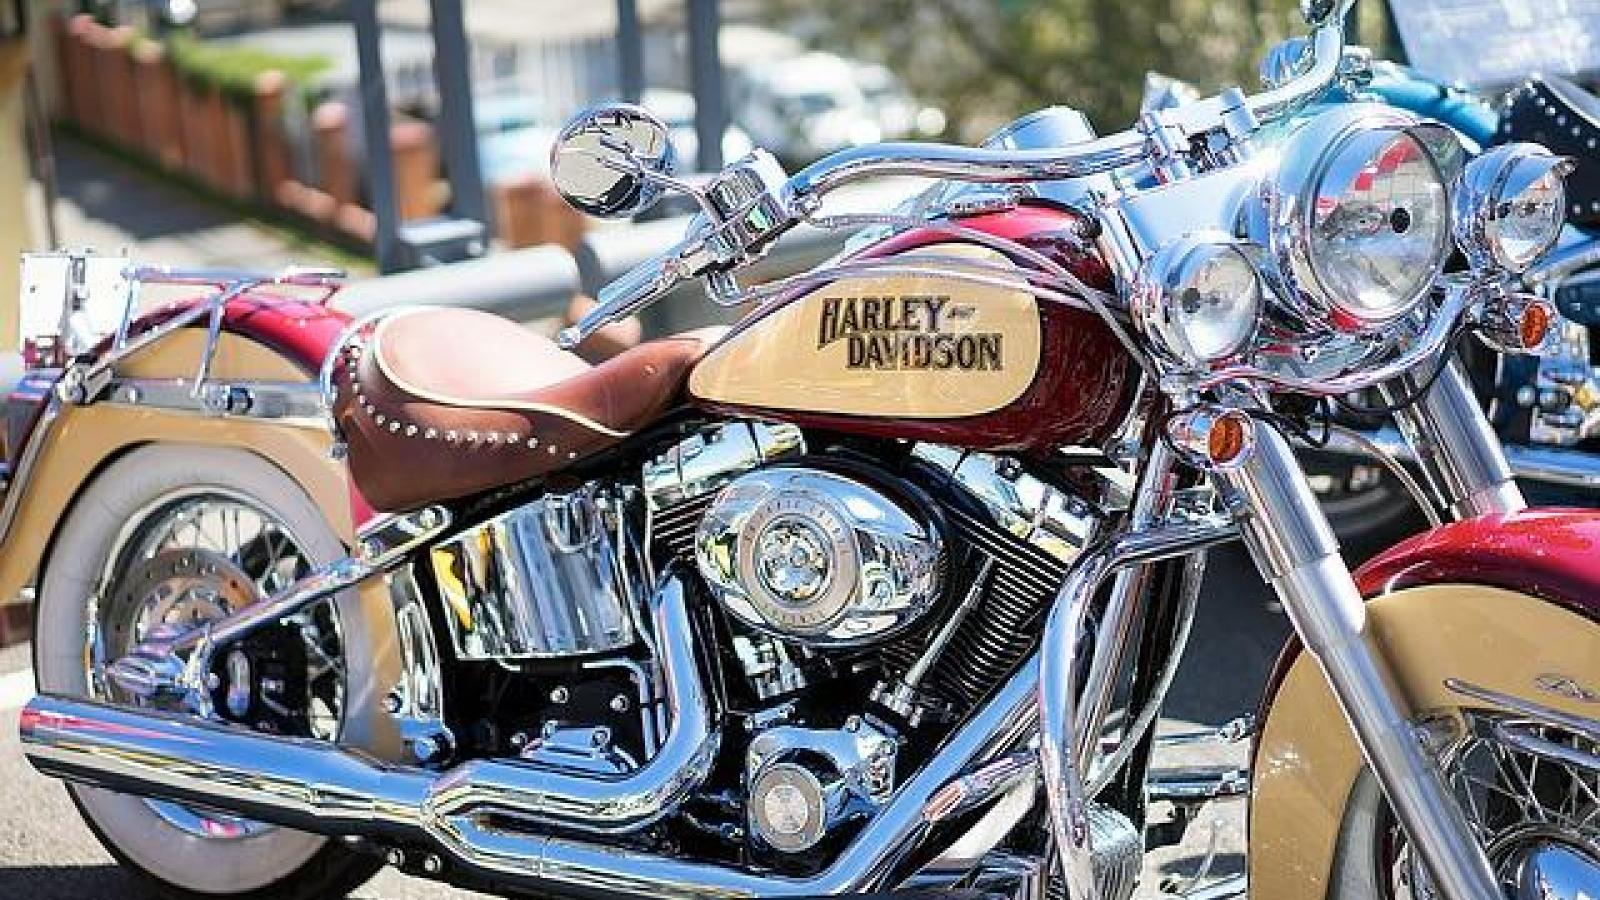 Harley Davidson Euro Festival 2015 in Saint Tropez